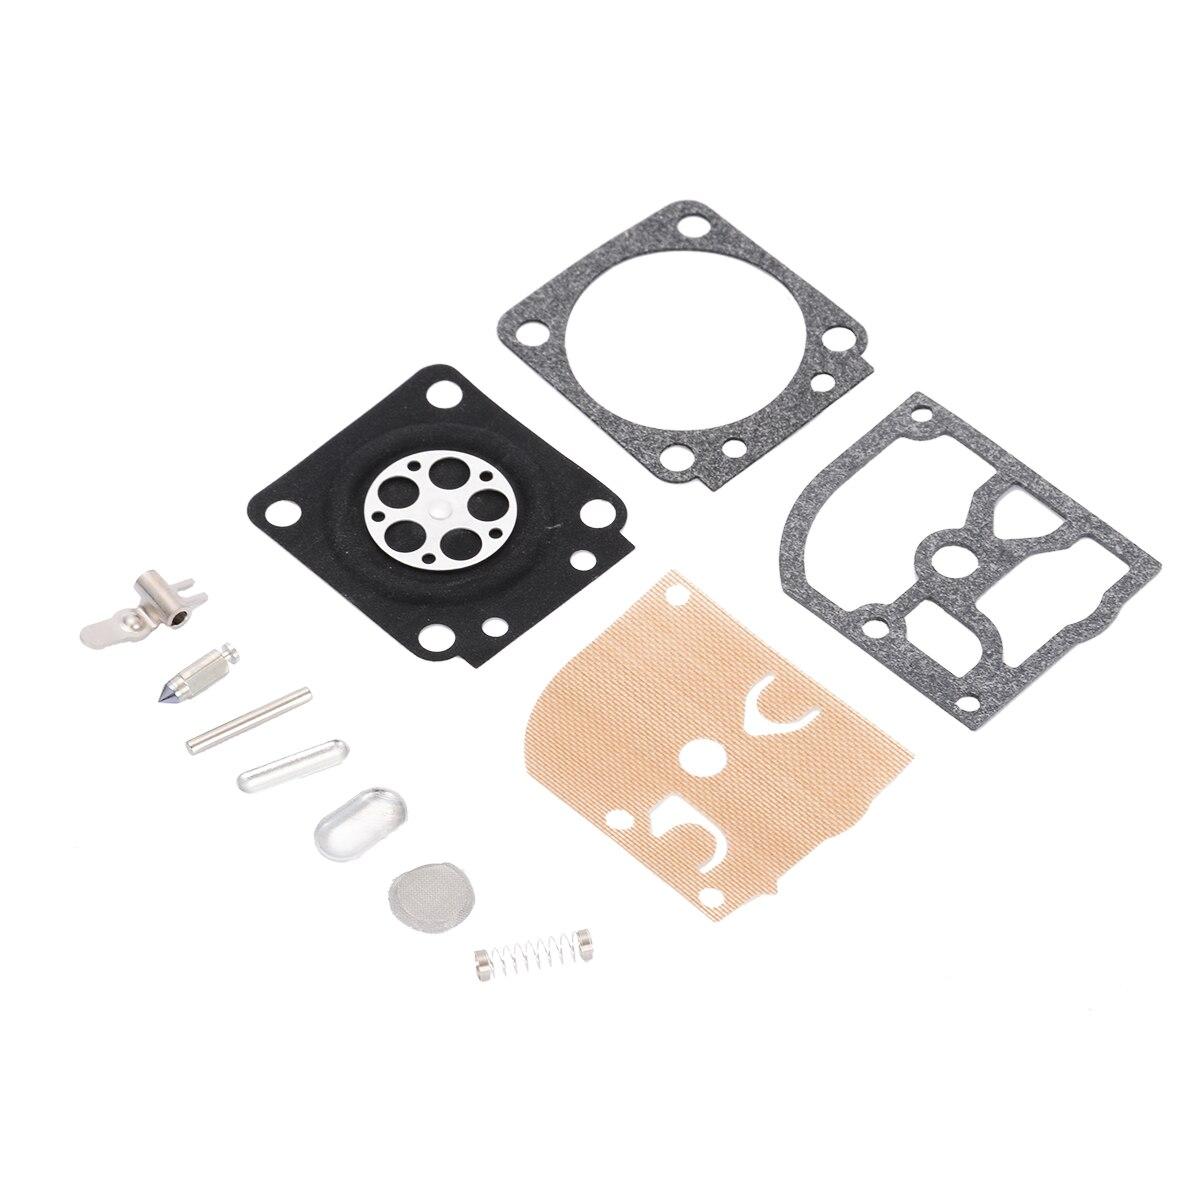 где купить Durable Carb Carburetor Repair Rebuild Kit Chainsaw Carburetors Gasket Repair Kits Fit For RB77 018 MS180 017 MS170 Mayitr по лучшей цене